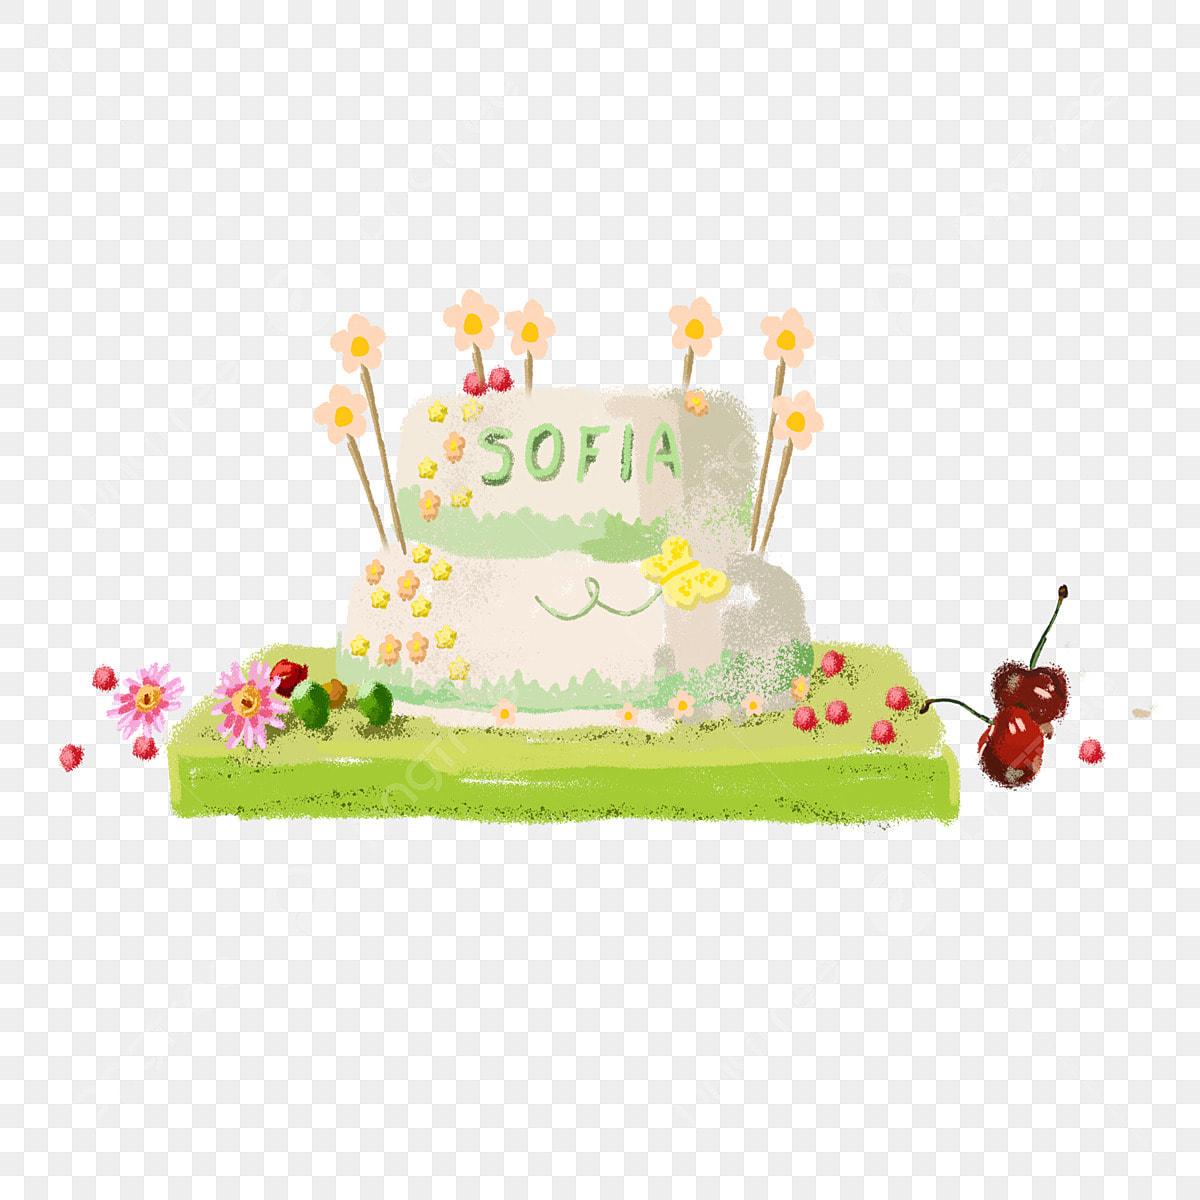 Marvelous Cartoon Pretty Birthday Cake Free Illustration Cartoon Delicious Funny Birthday Cards Online Fluifree Goldxyz